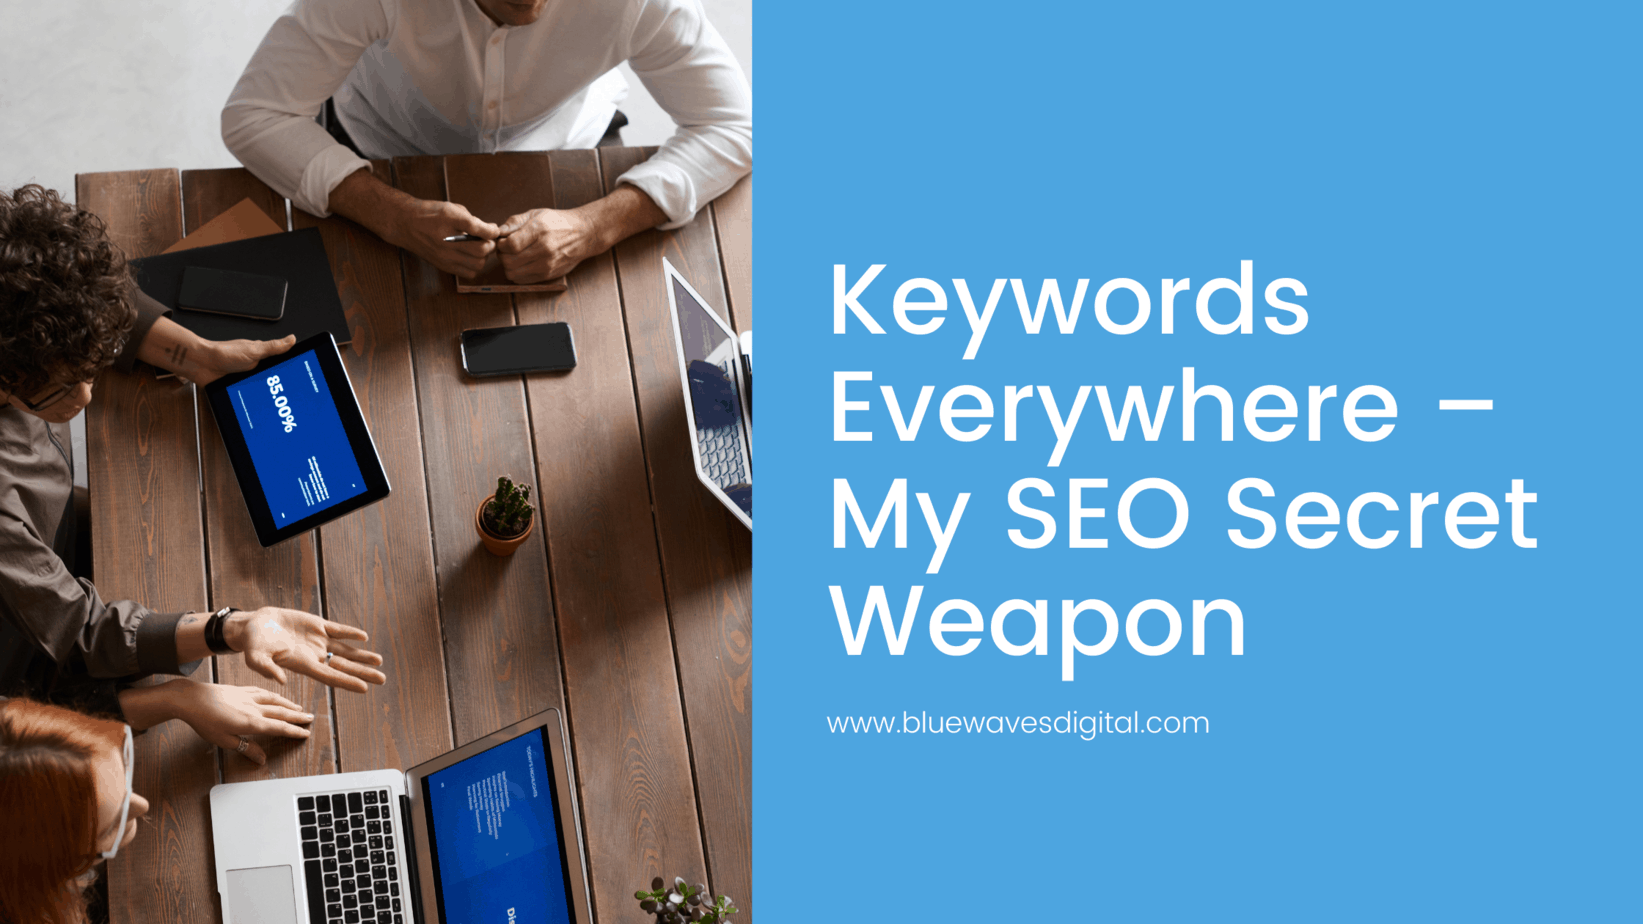 Keywords Everywhere – My SEO Secret Weapon